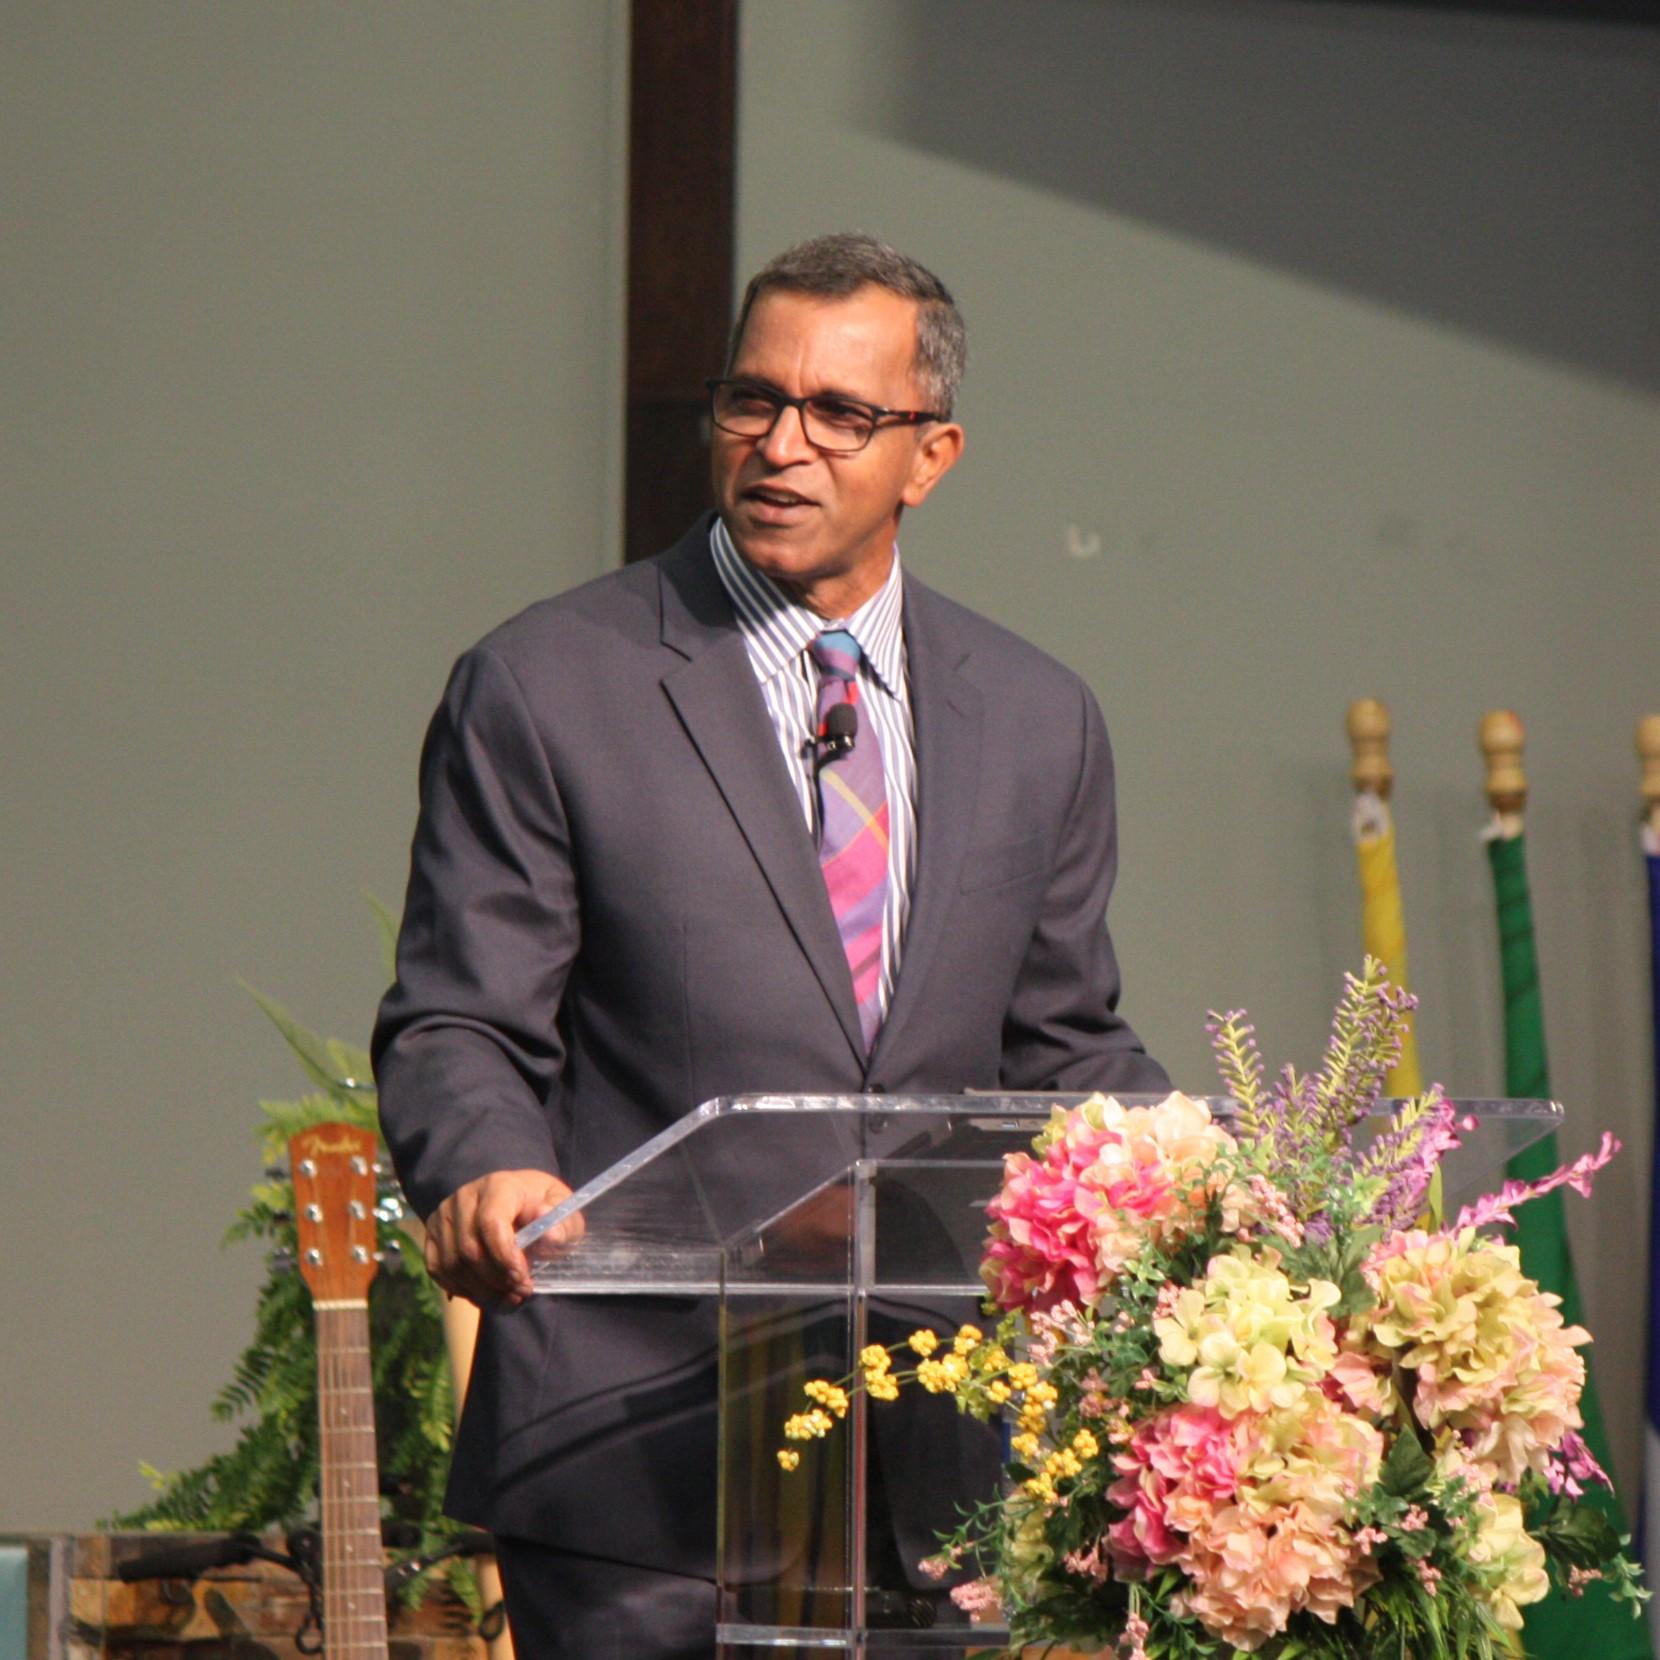 Pastor Sam Chetty